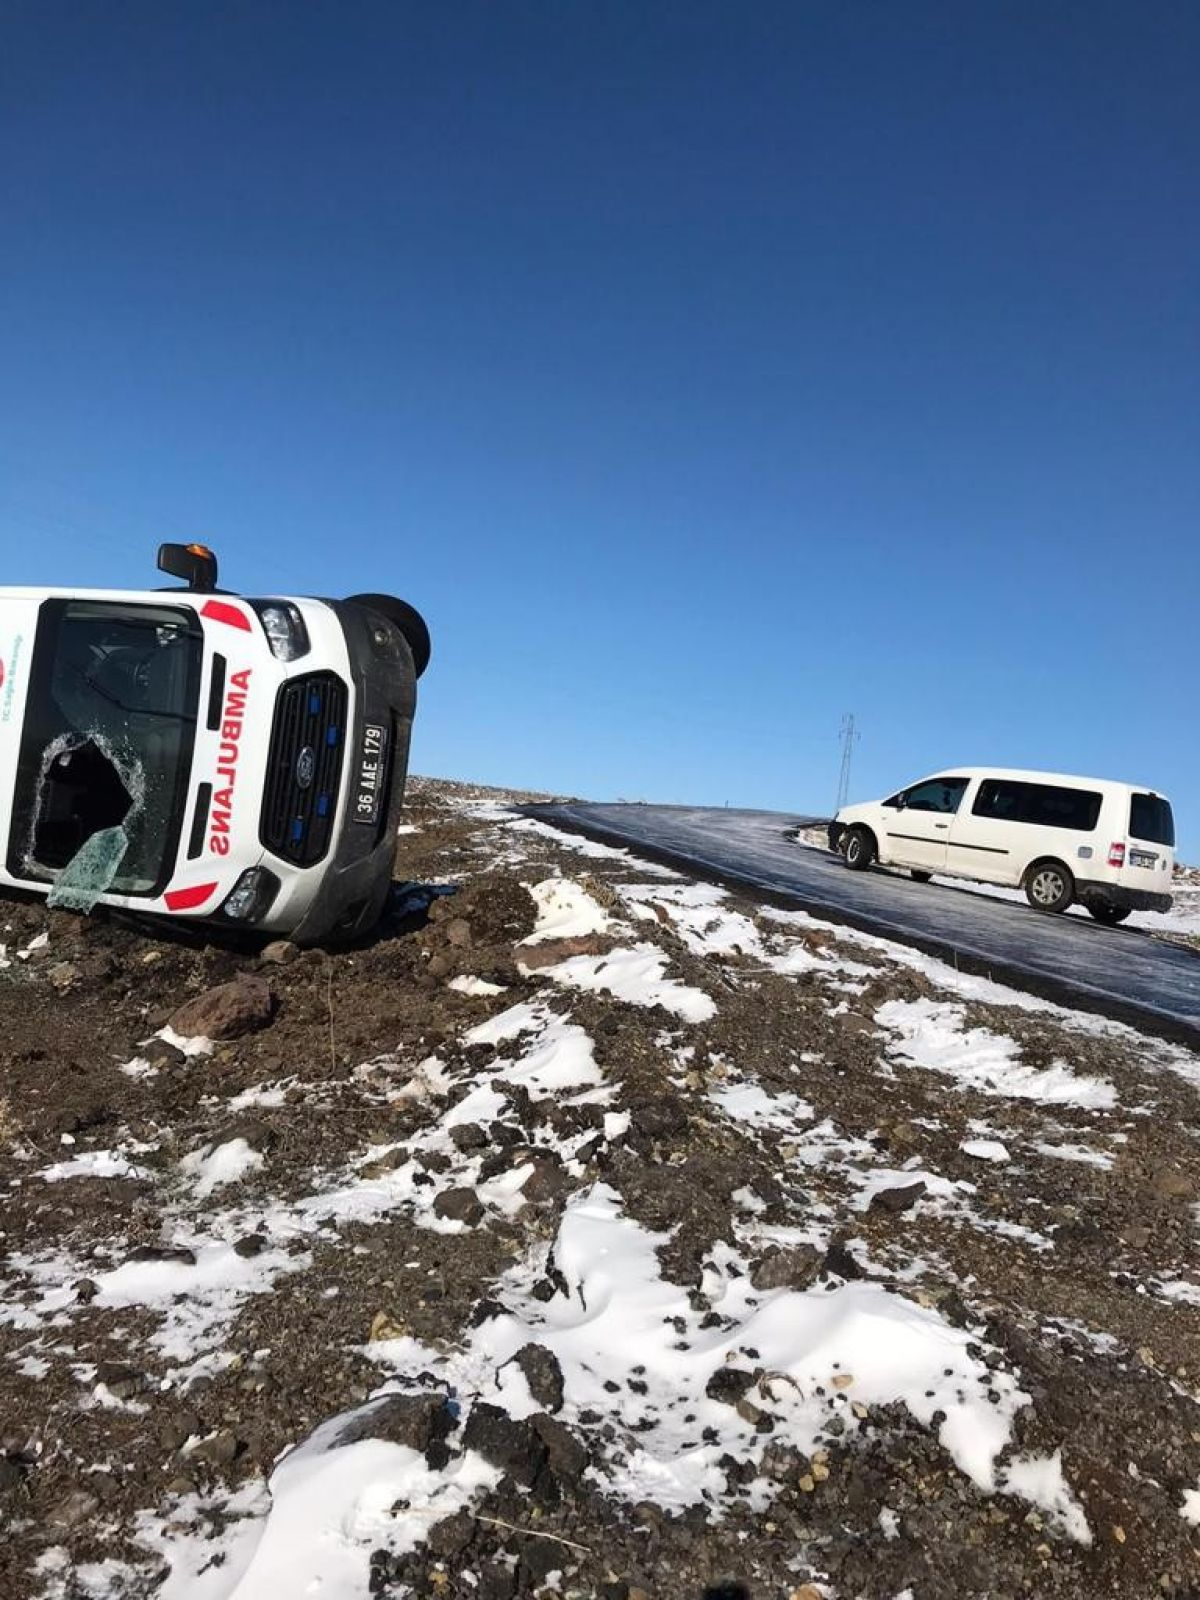 Kars'ta hasta almaya giden ambulans takla attı: 3 yaralı #2